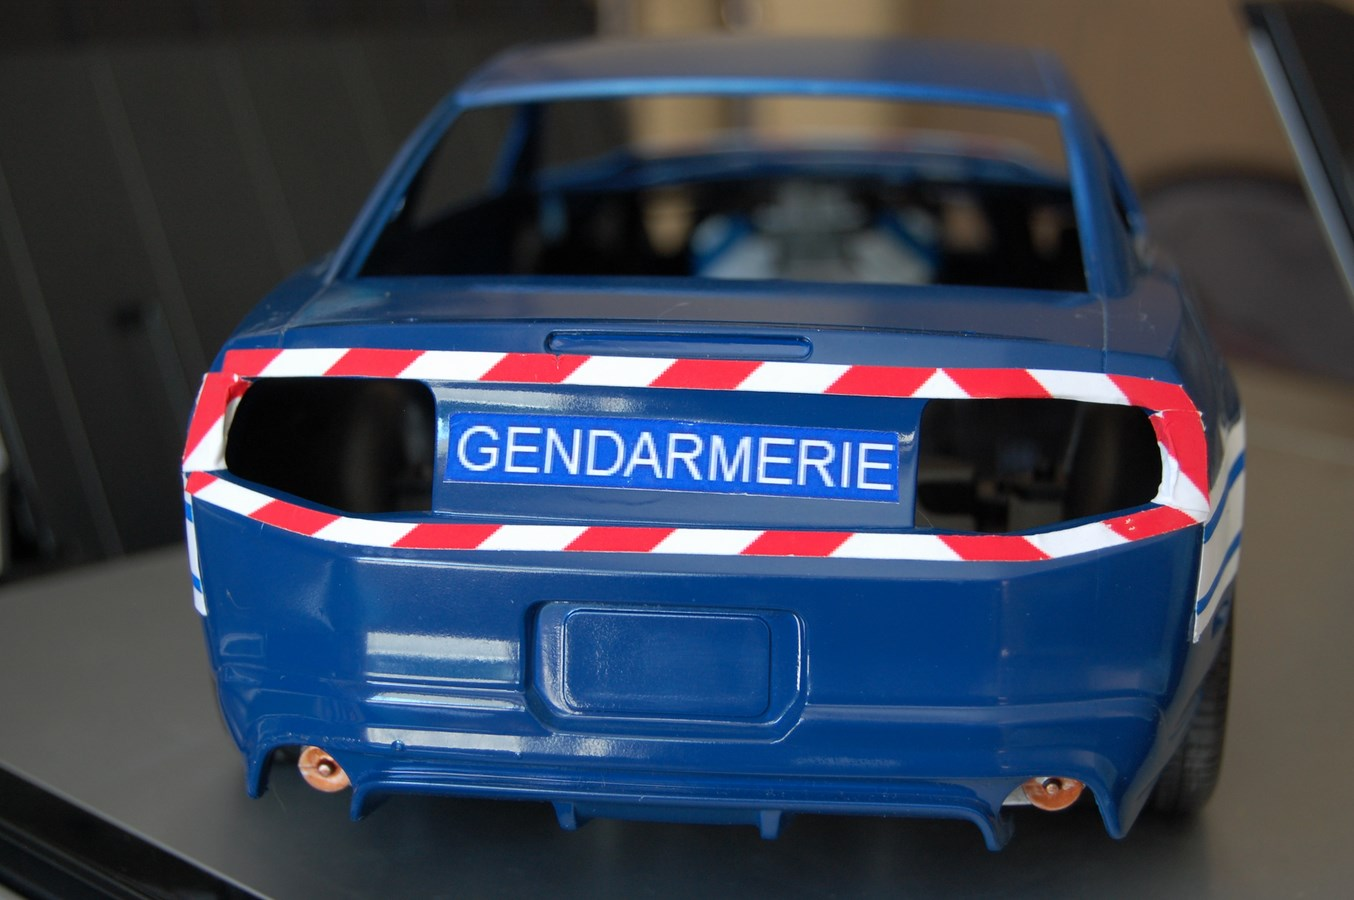 Shelby GT 500 version imaginaire Gendarmerie - Page 2 803490Mustag27Copier